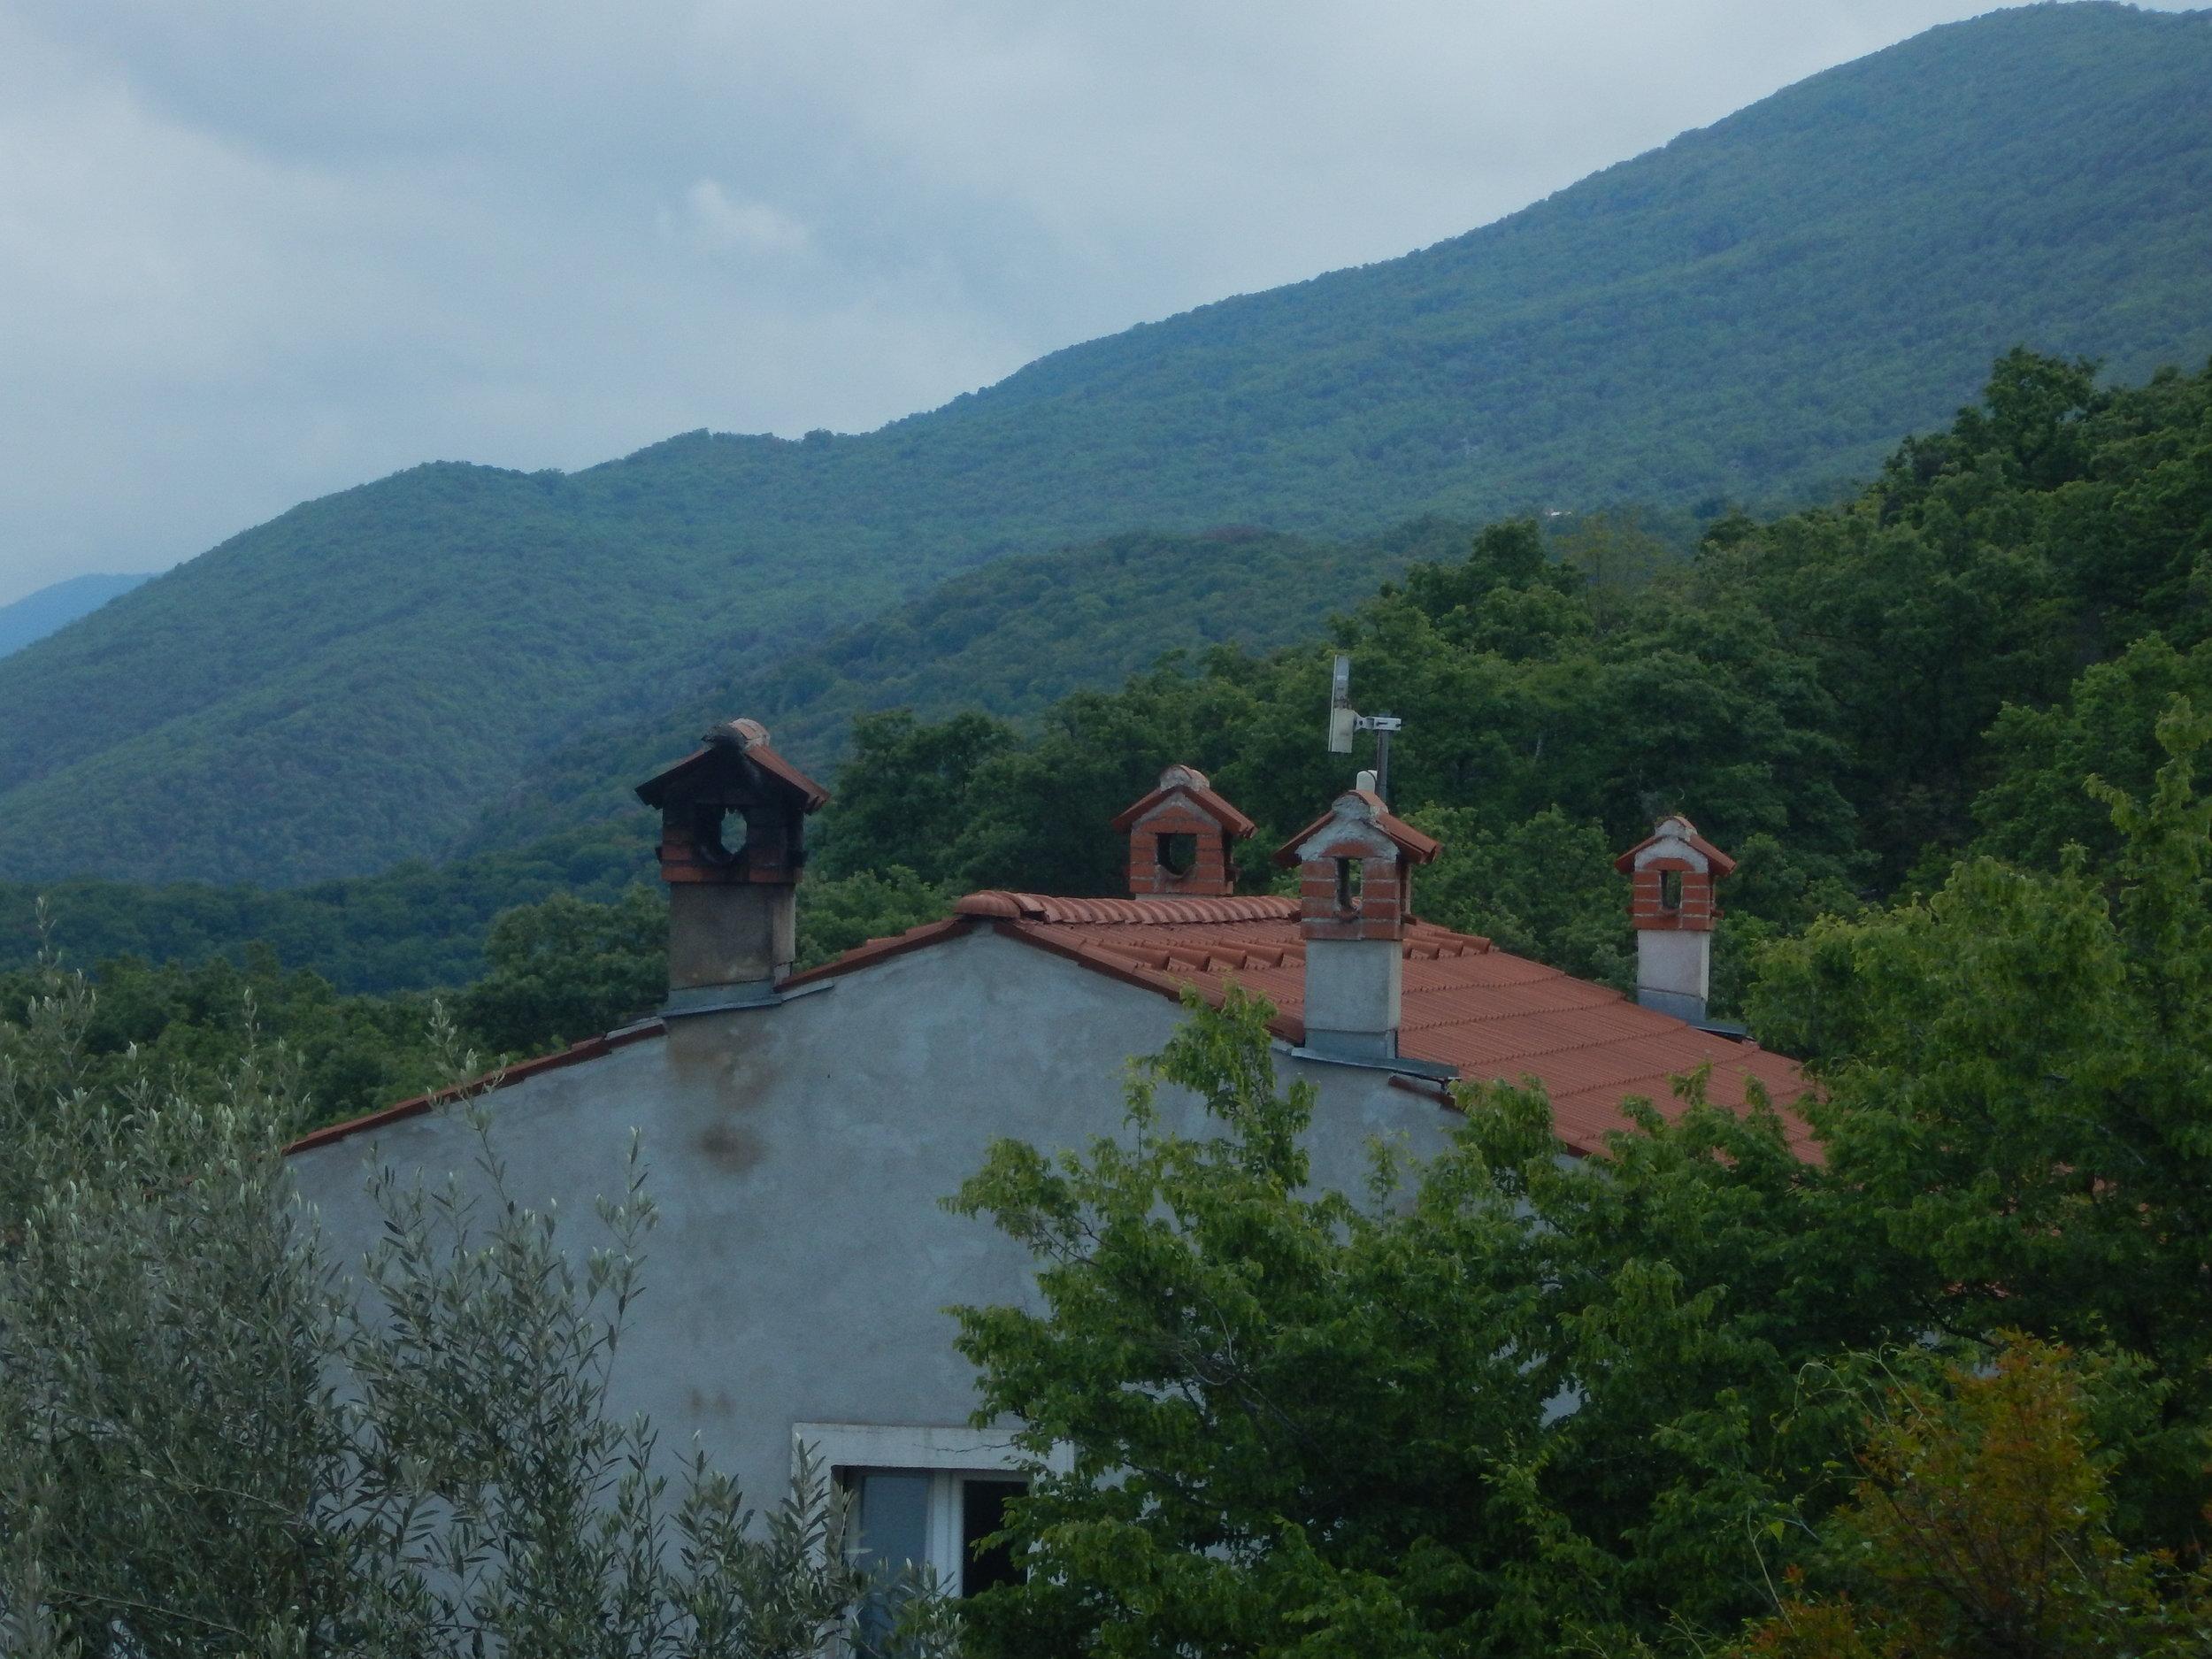 More traditional chimney tops. Sveti Petar, Cres Island.